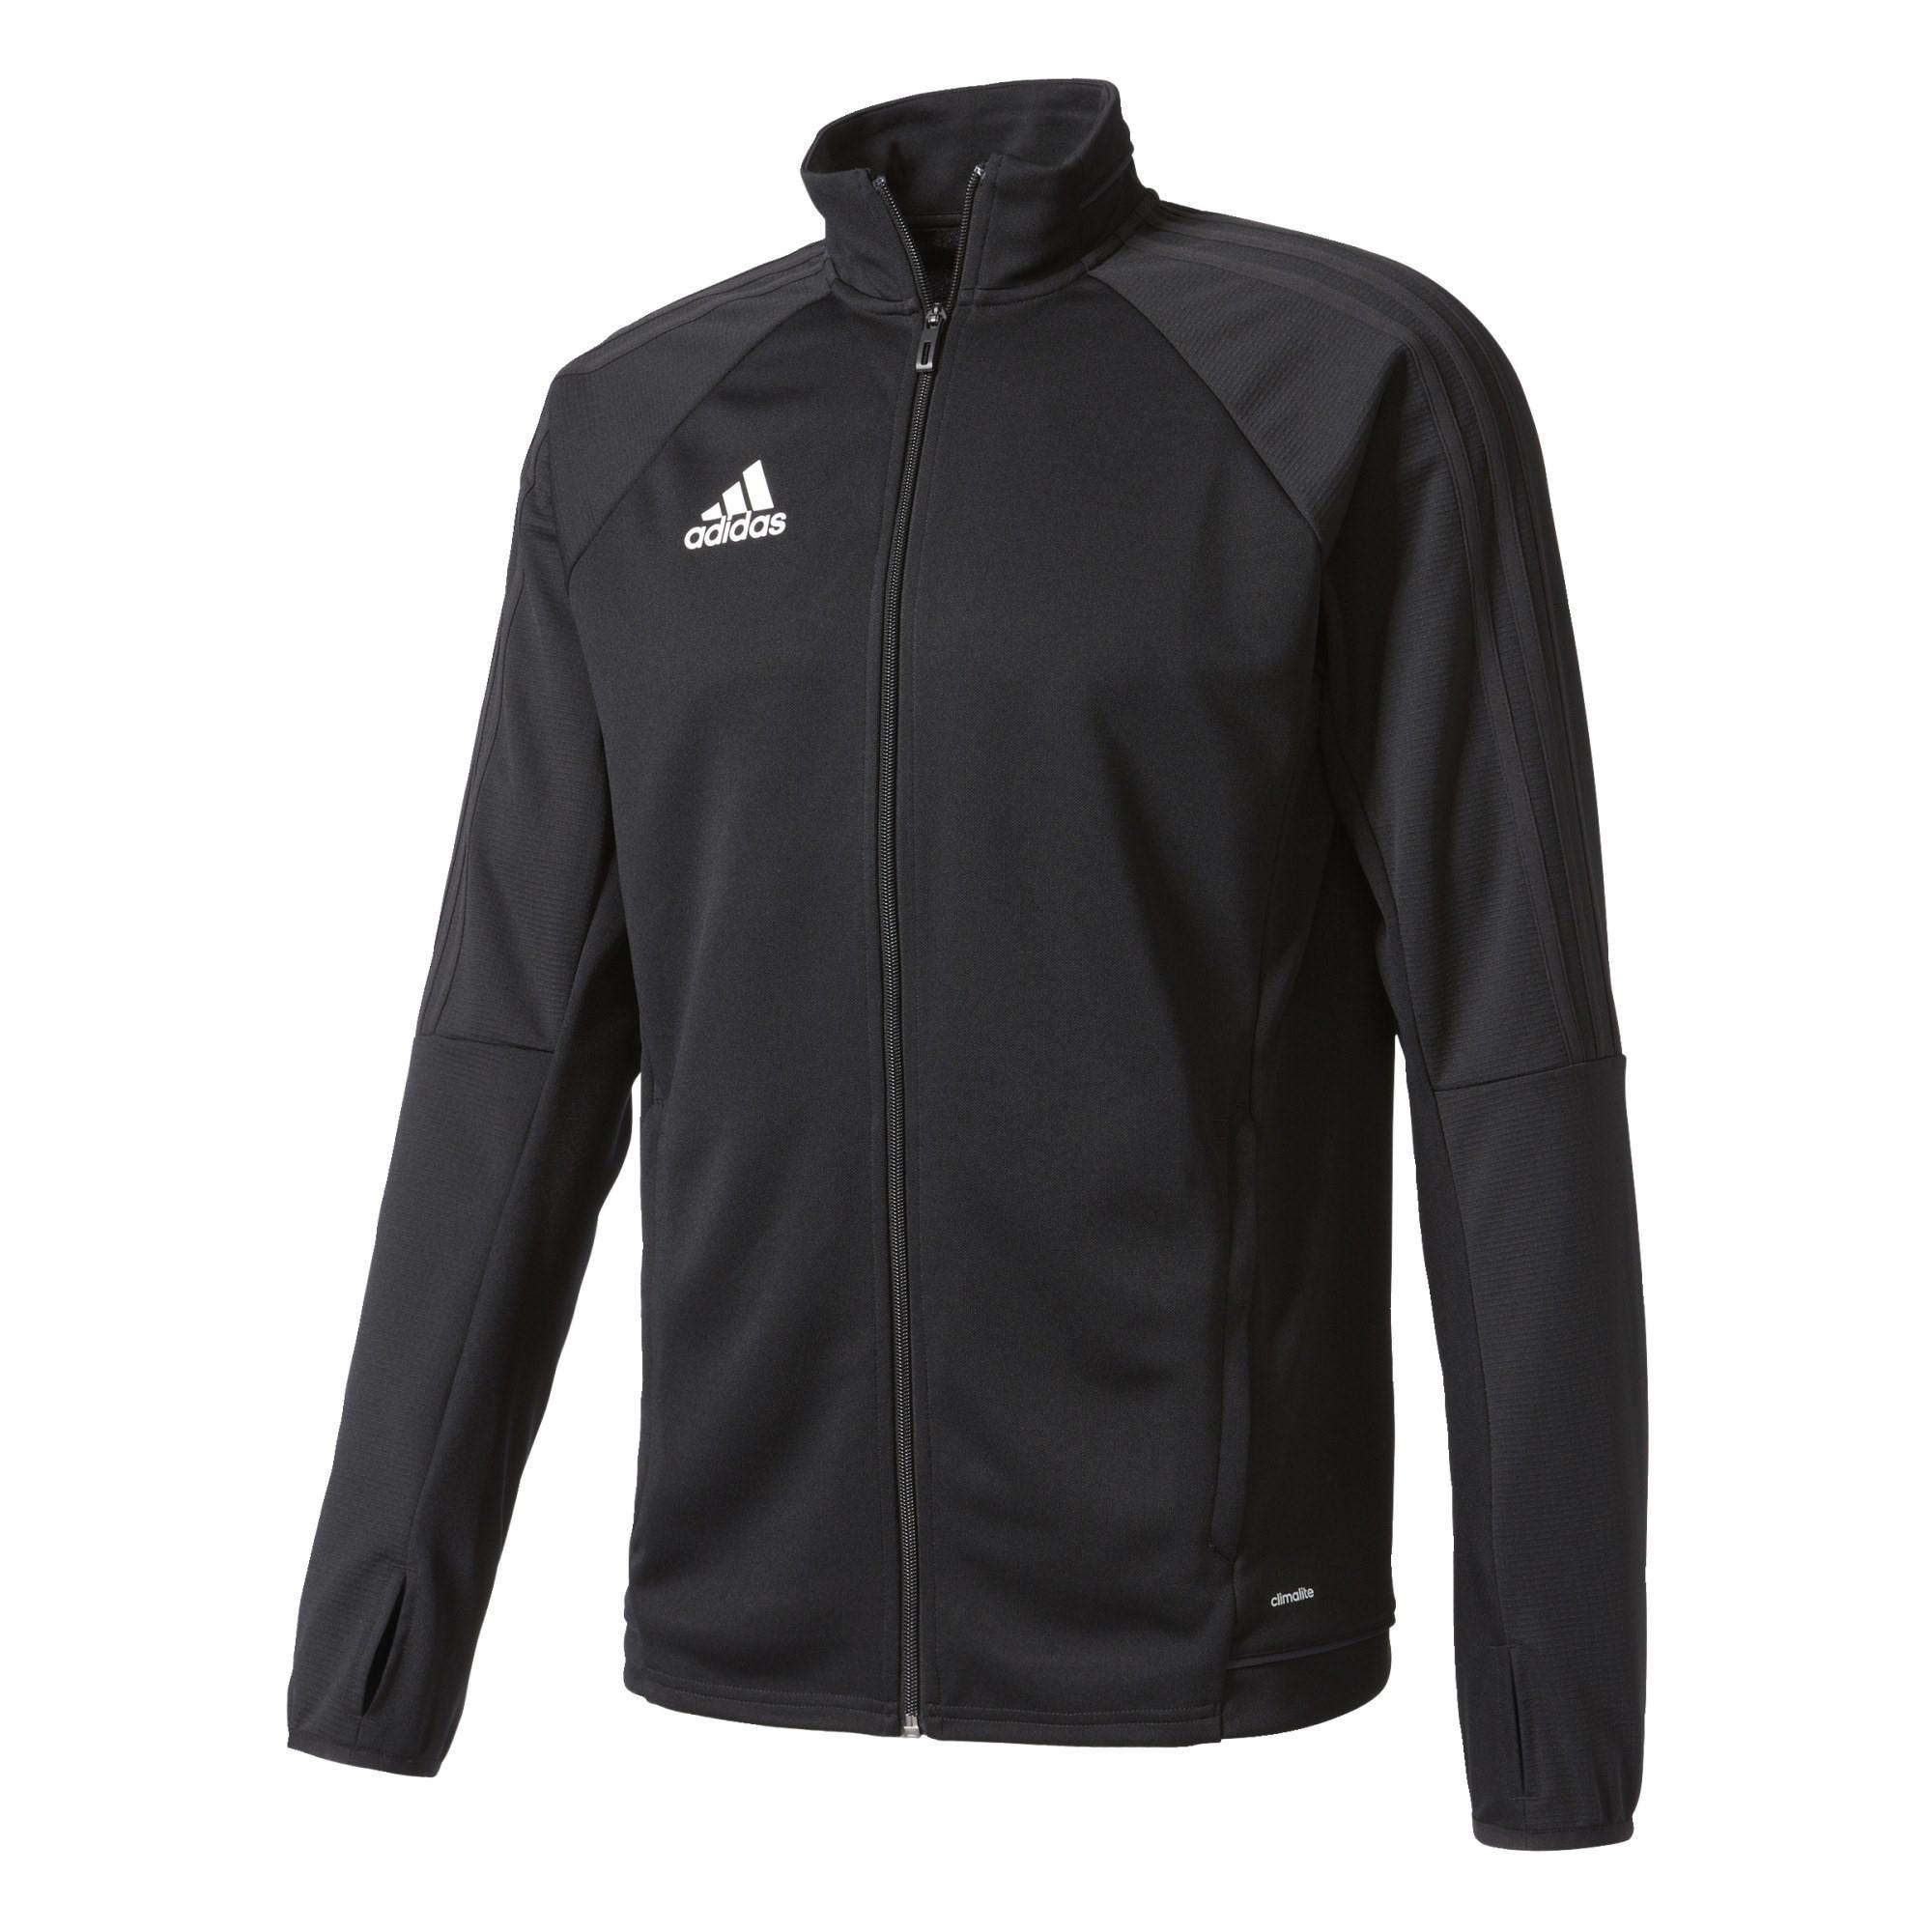 Adidas Tiro 17 Trg Jkt Sr. Voetbalsweater